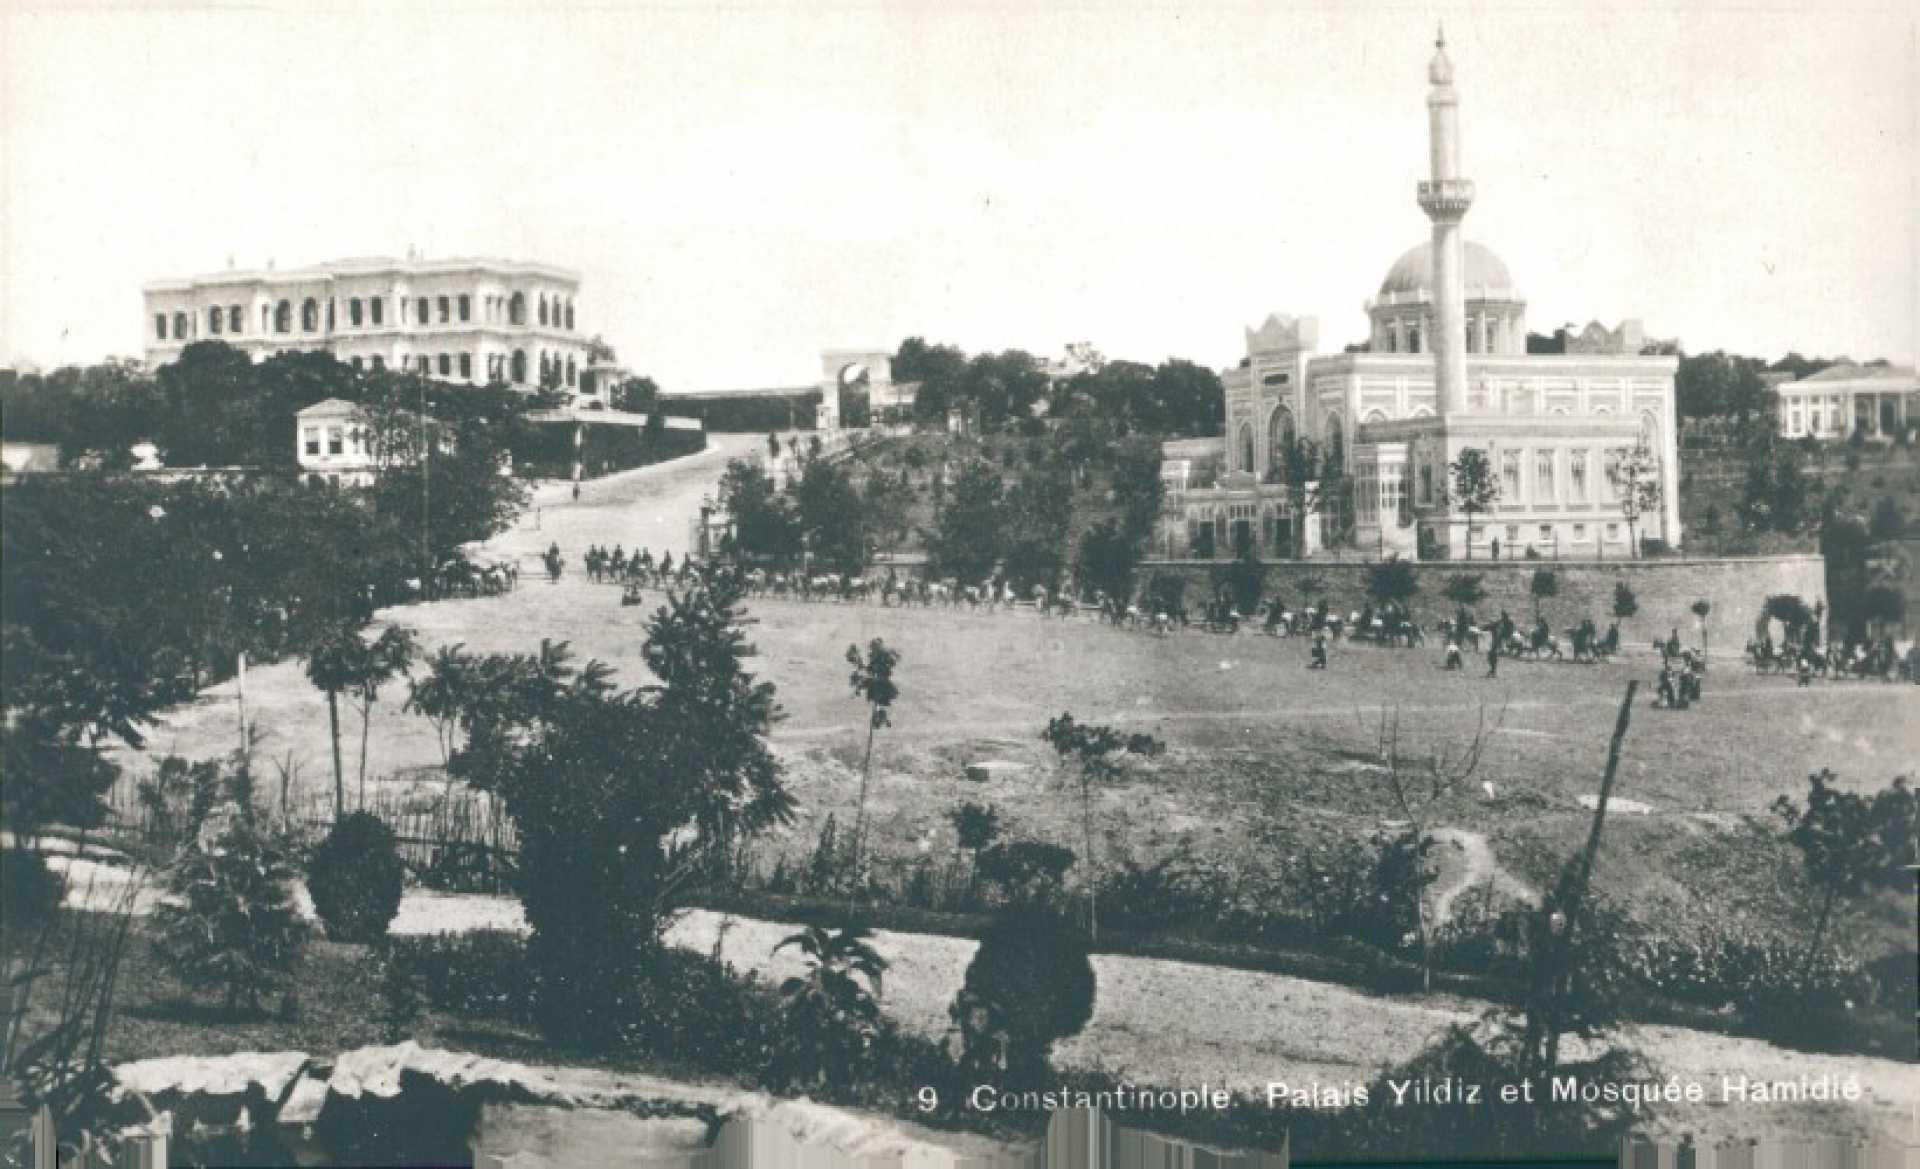 Constantinople. Palais Yildiz et Mosquee Hamidie